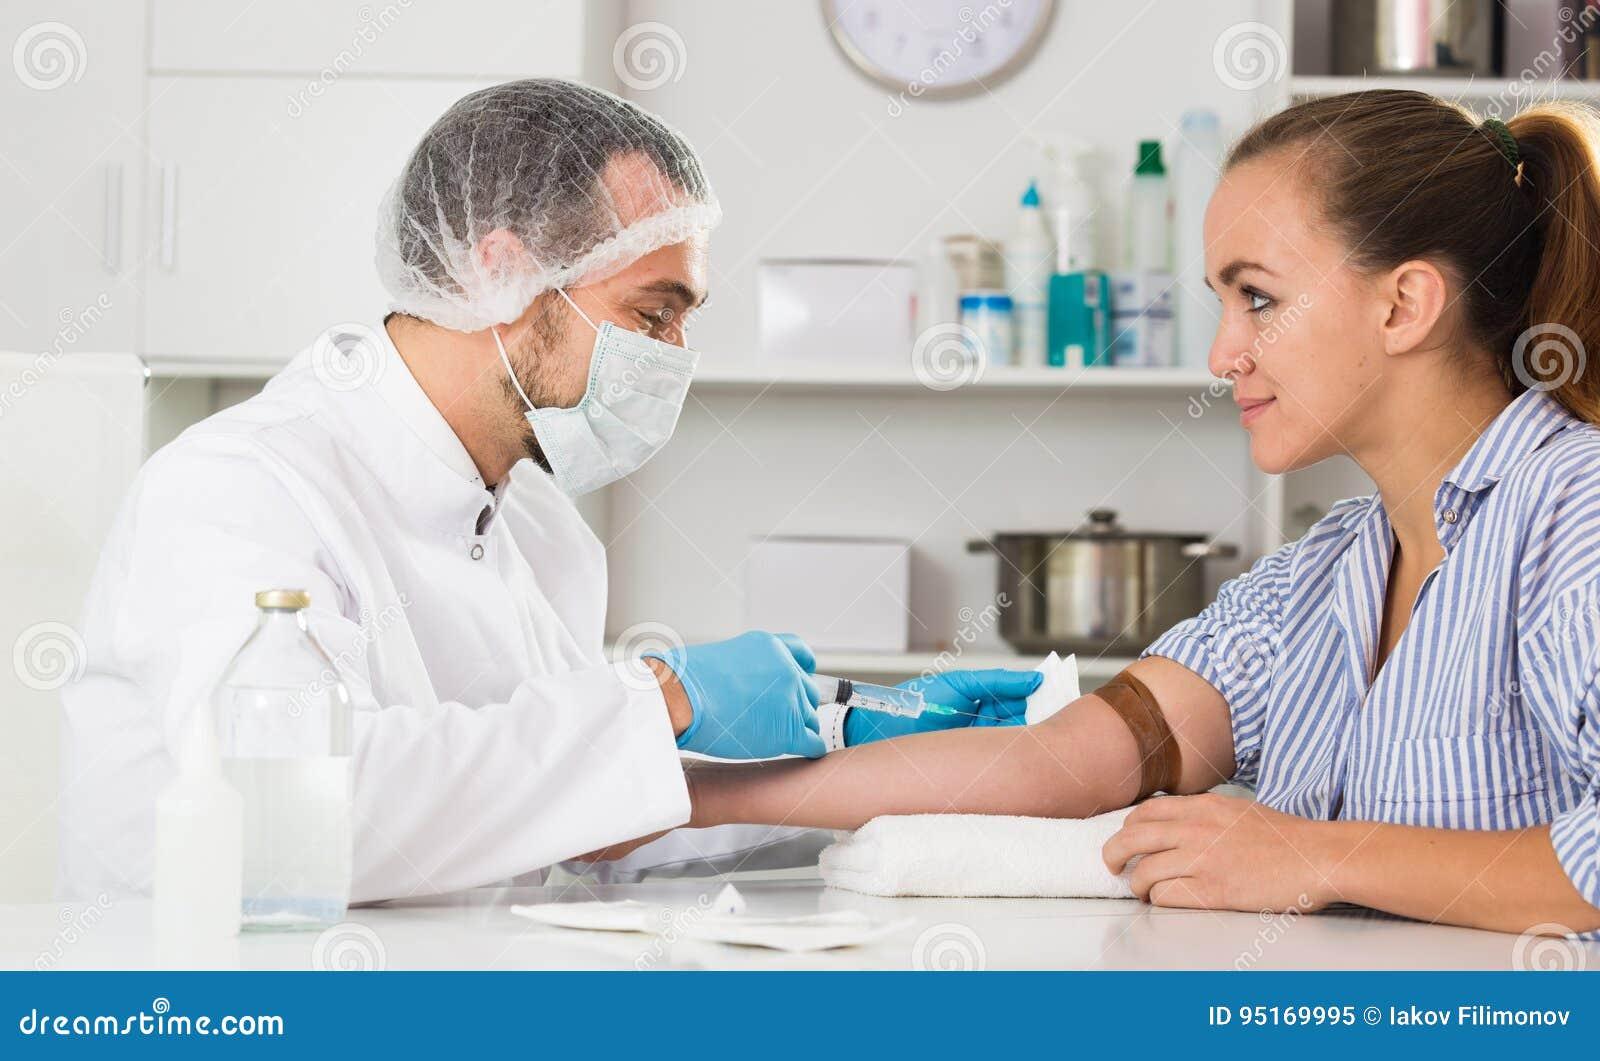 Women Injecting Men